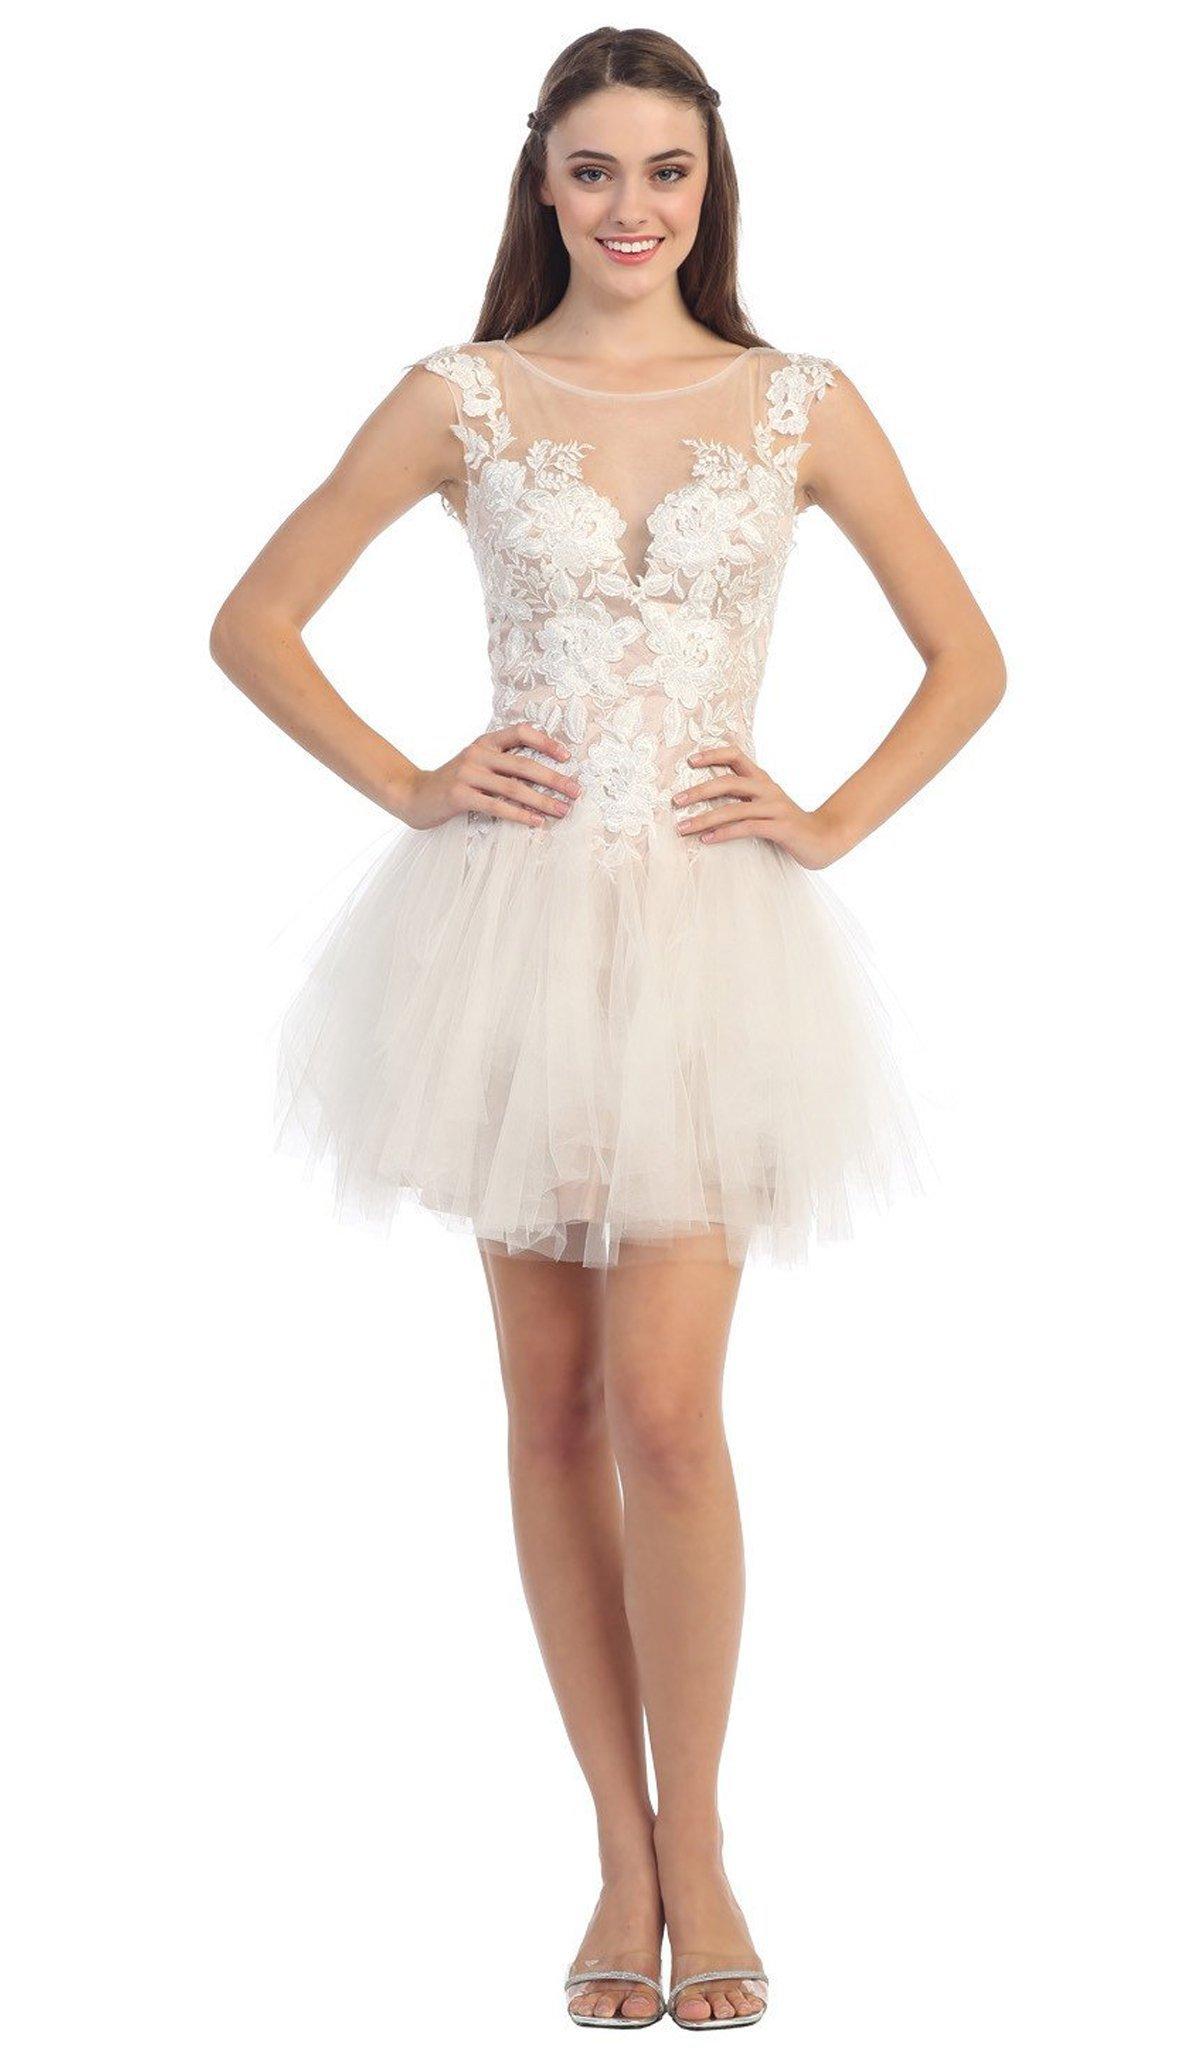 Eureka Fashion - 3911 Lace Embroidered Mesh A-line Dress